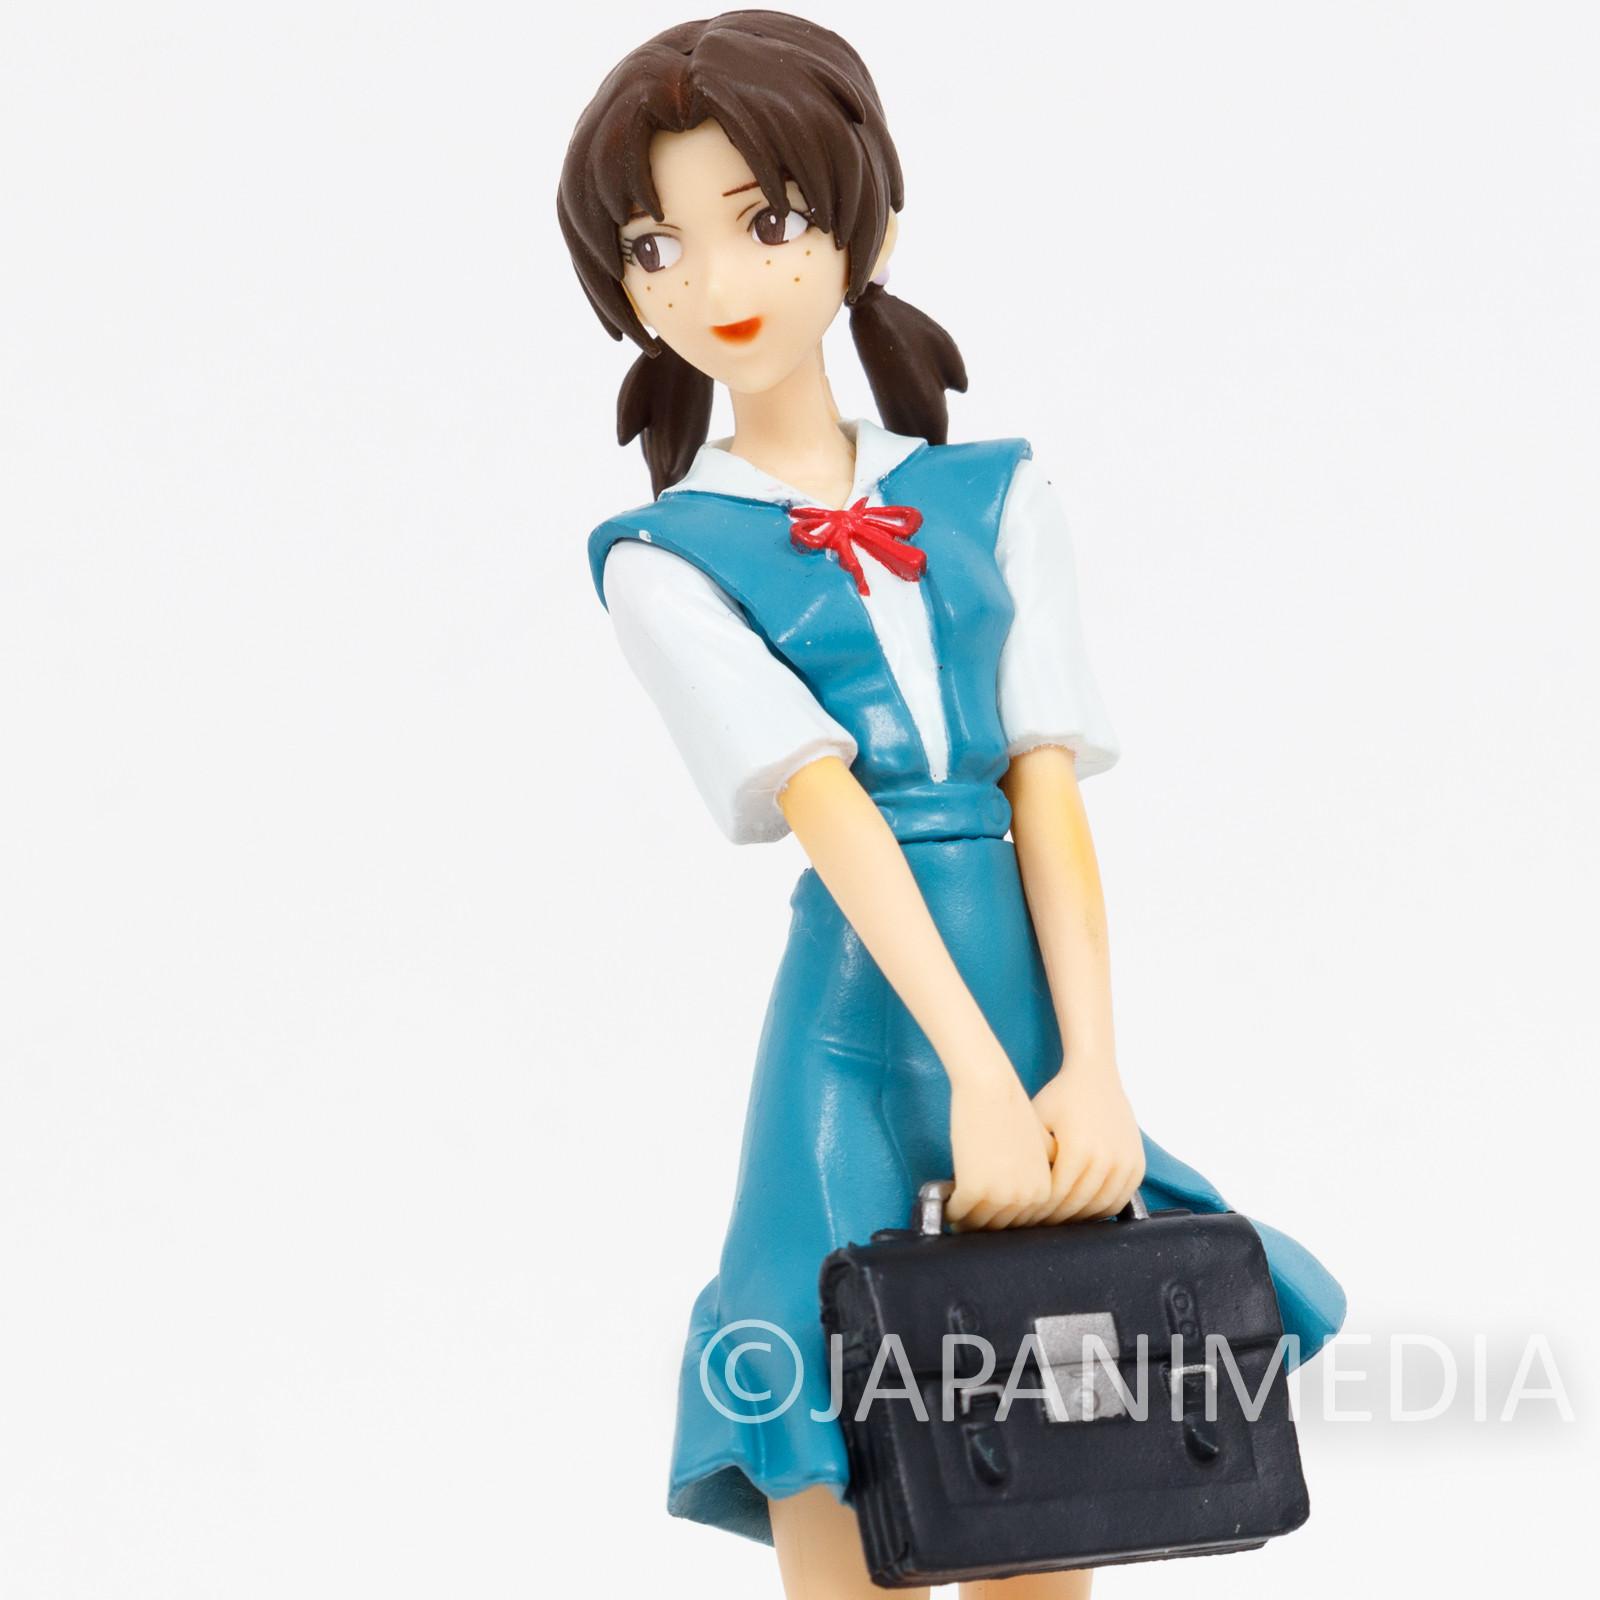 Evangelion Hikari Horaki Portraits Figure Series 3 BANDAI JAPAN